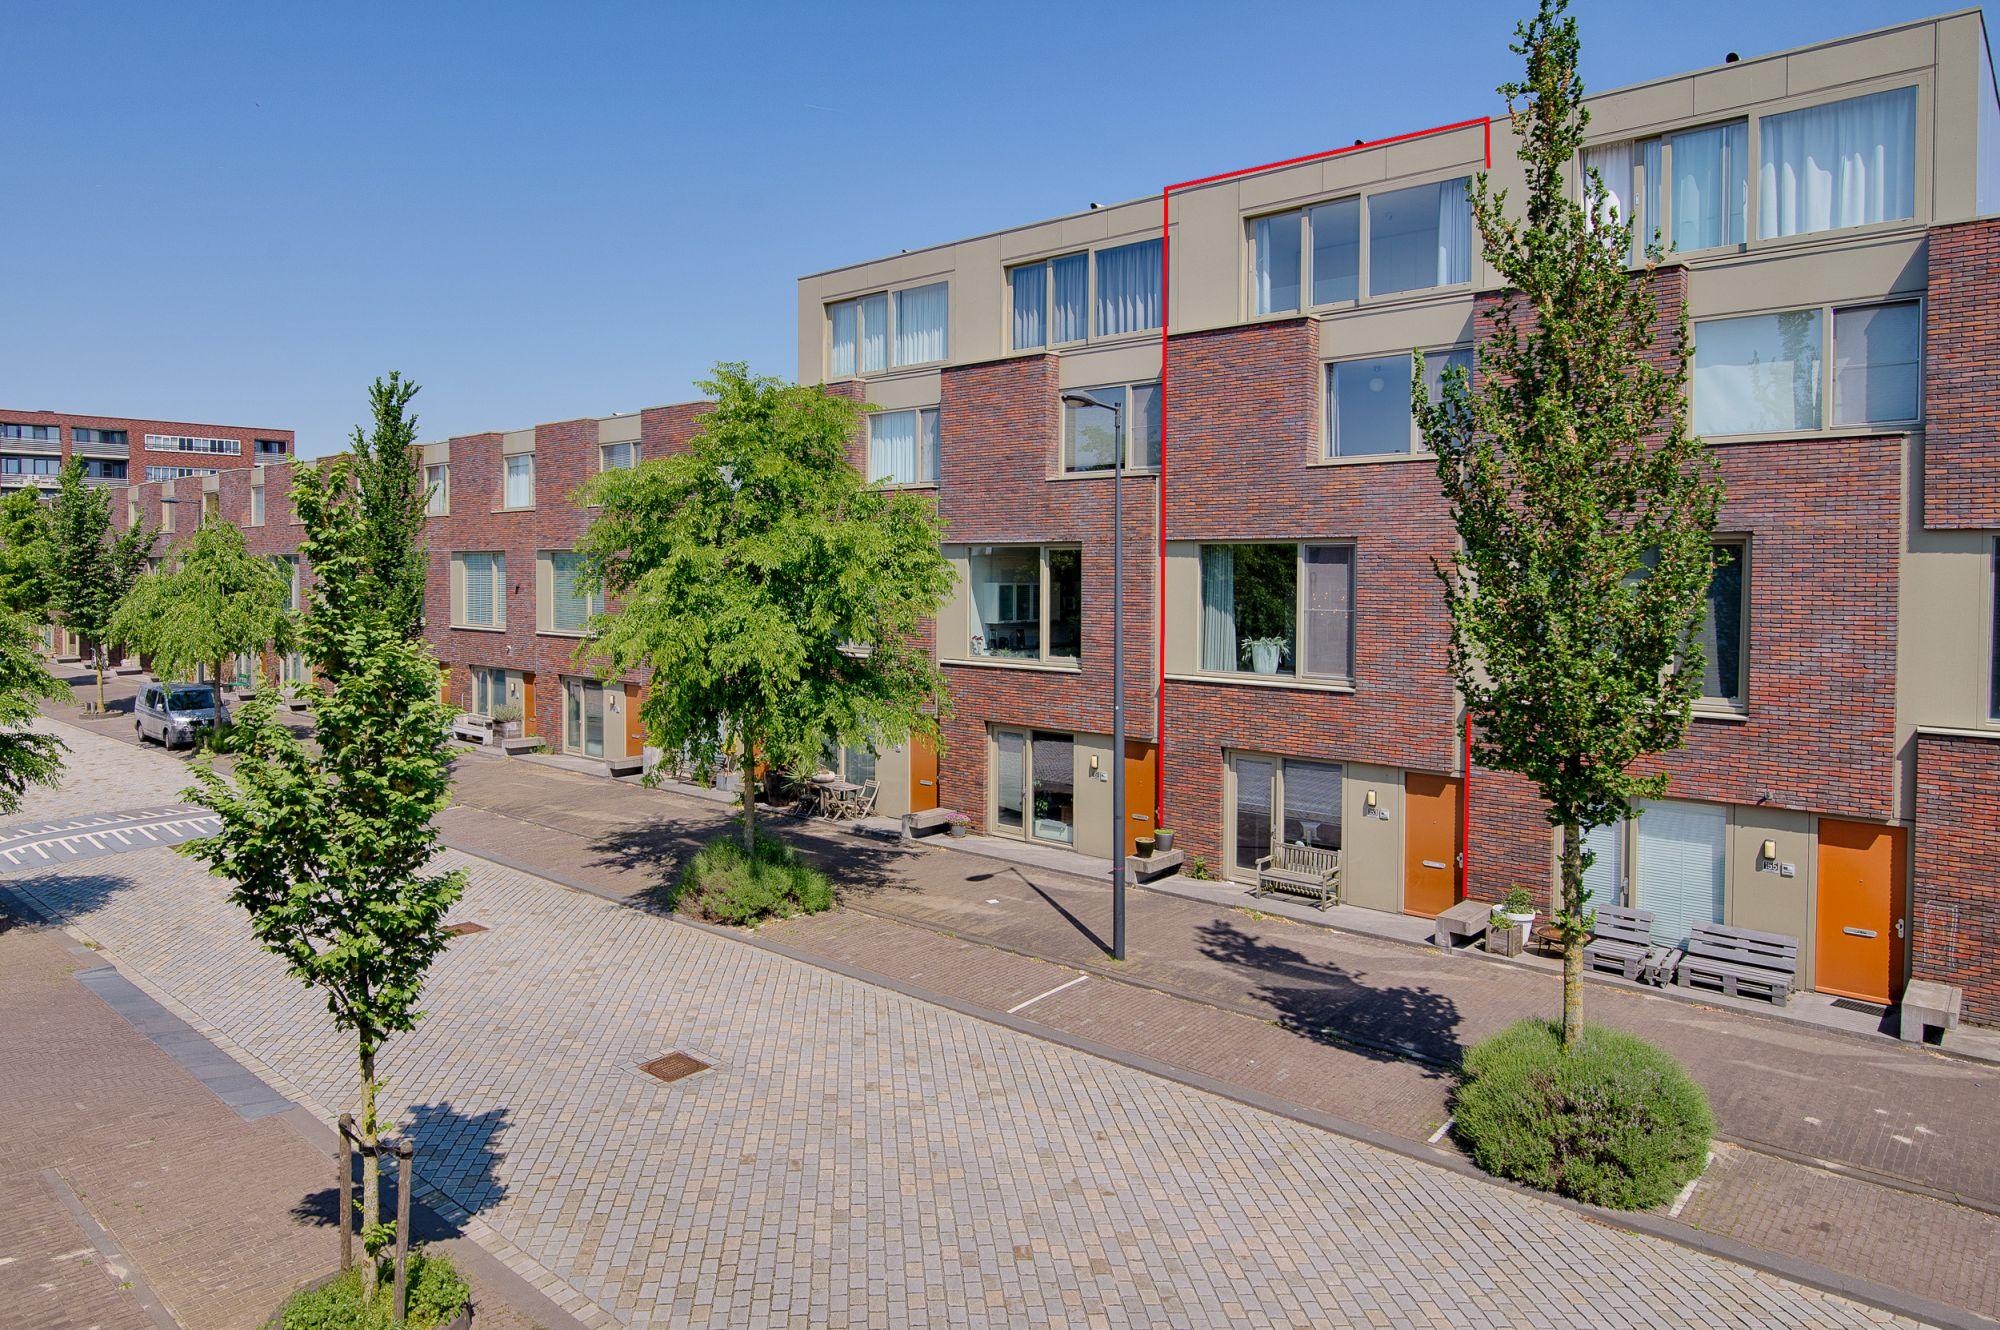 Jan Vrijmanstraat, Amsterdam